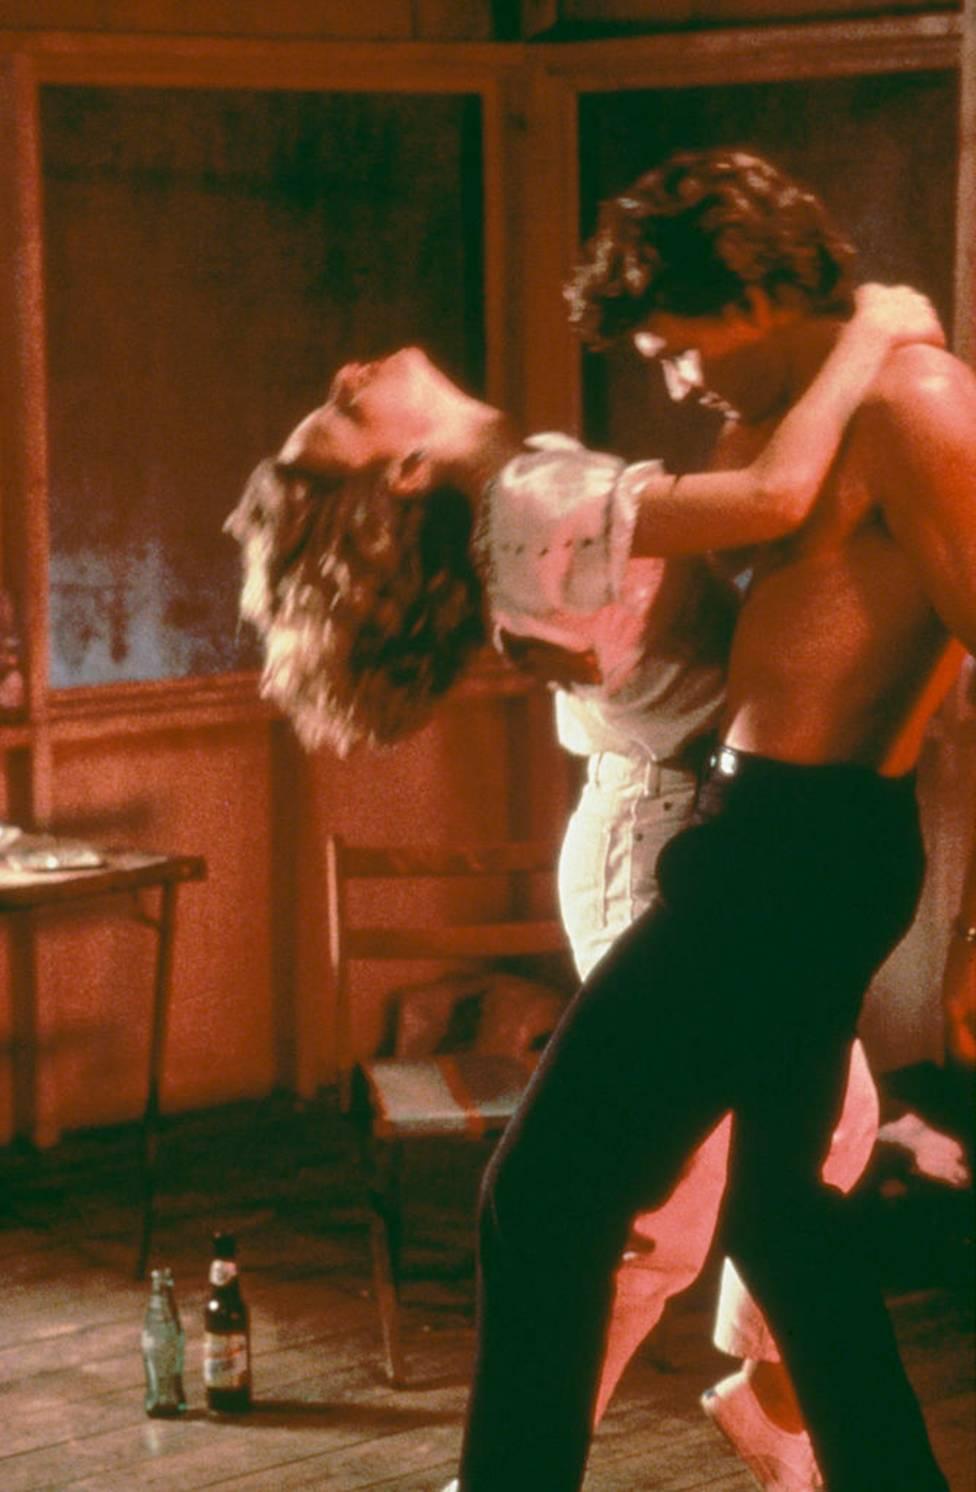 Dženifer Grej i Patrik Svejzi u Prljavom plesu